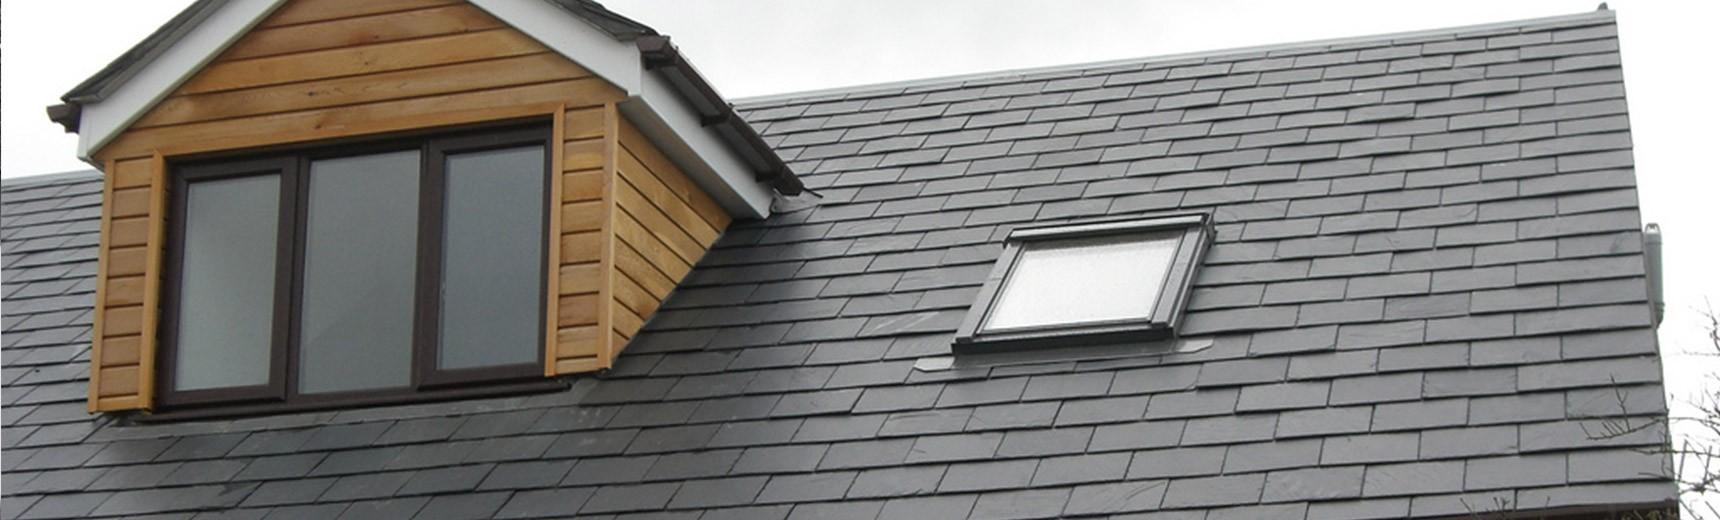 Velux Windows Leicester Skylight Installation Your